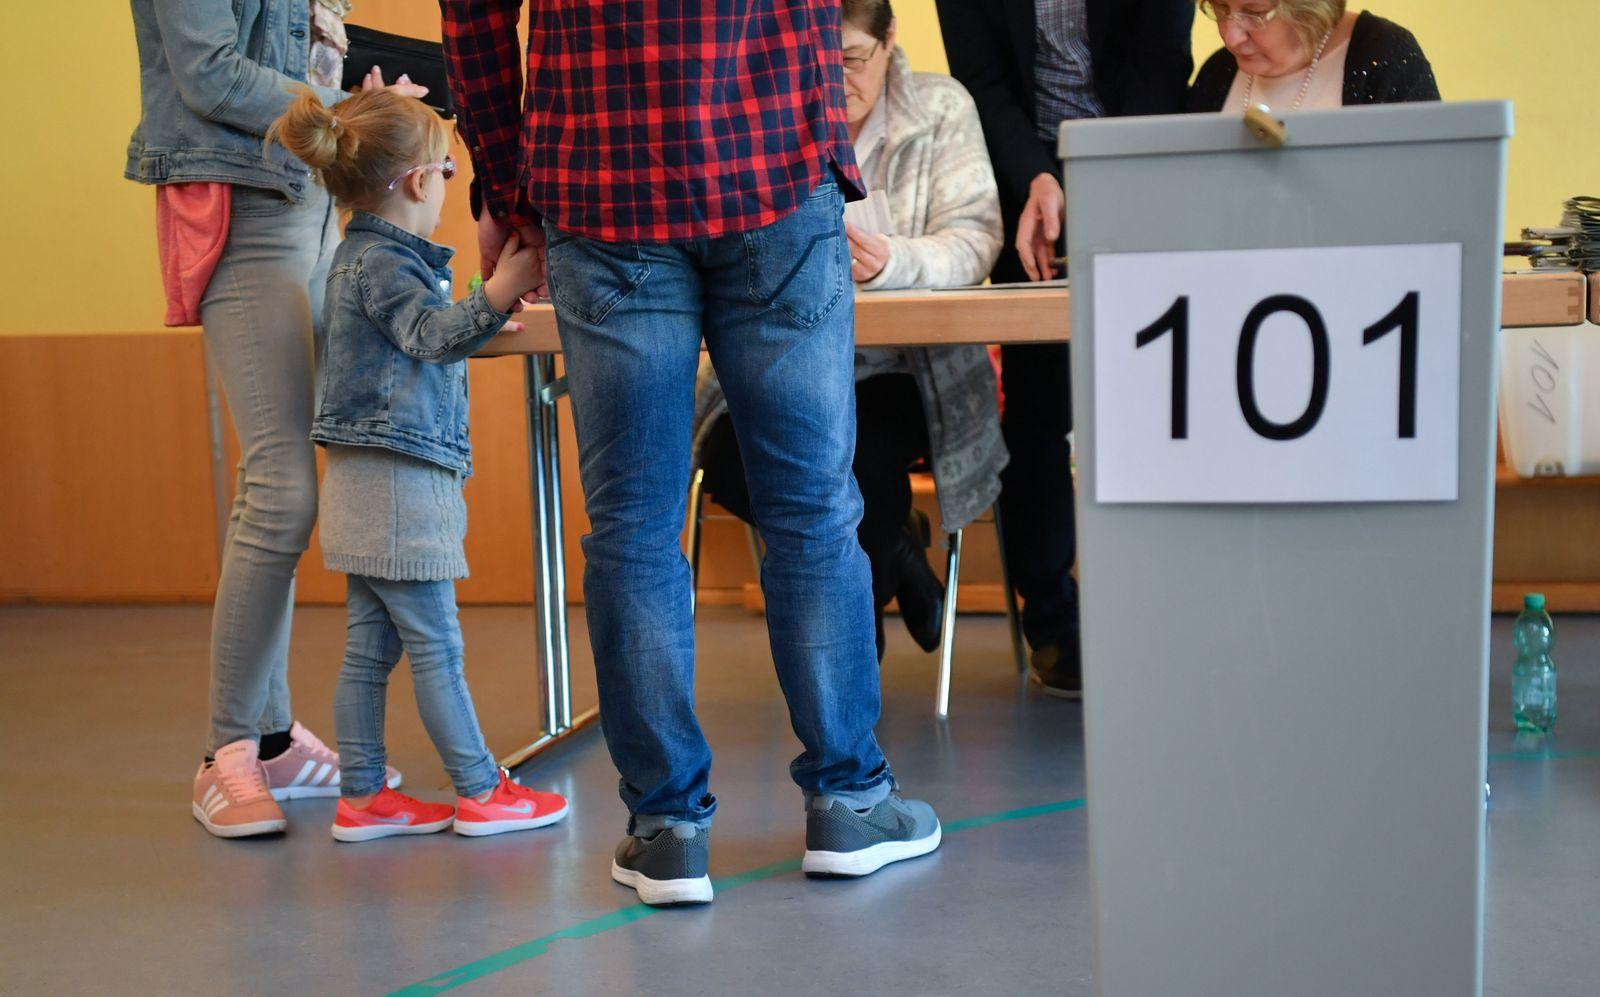 Landtagswahl Saarland - CDU